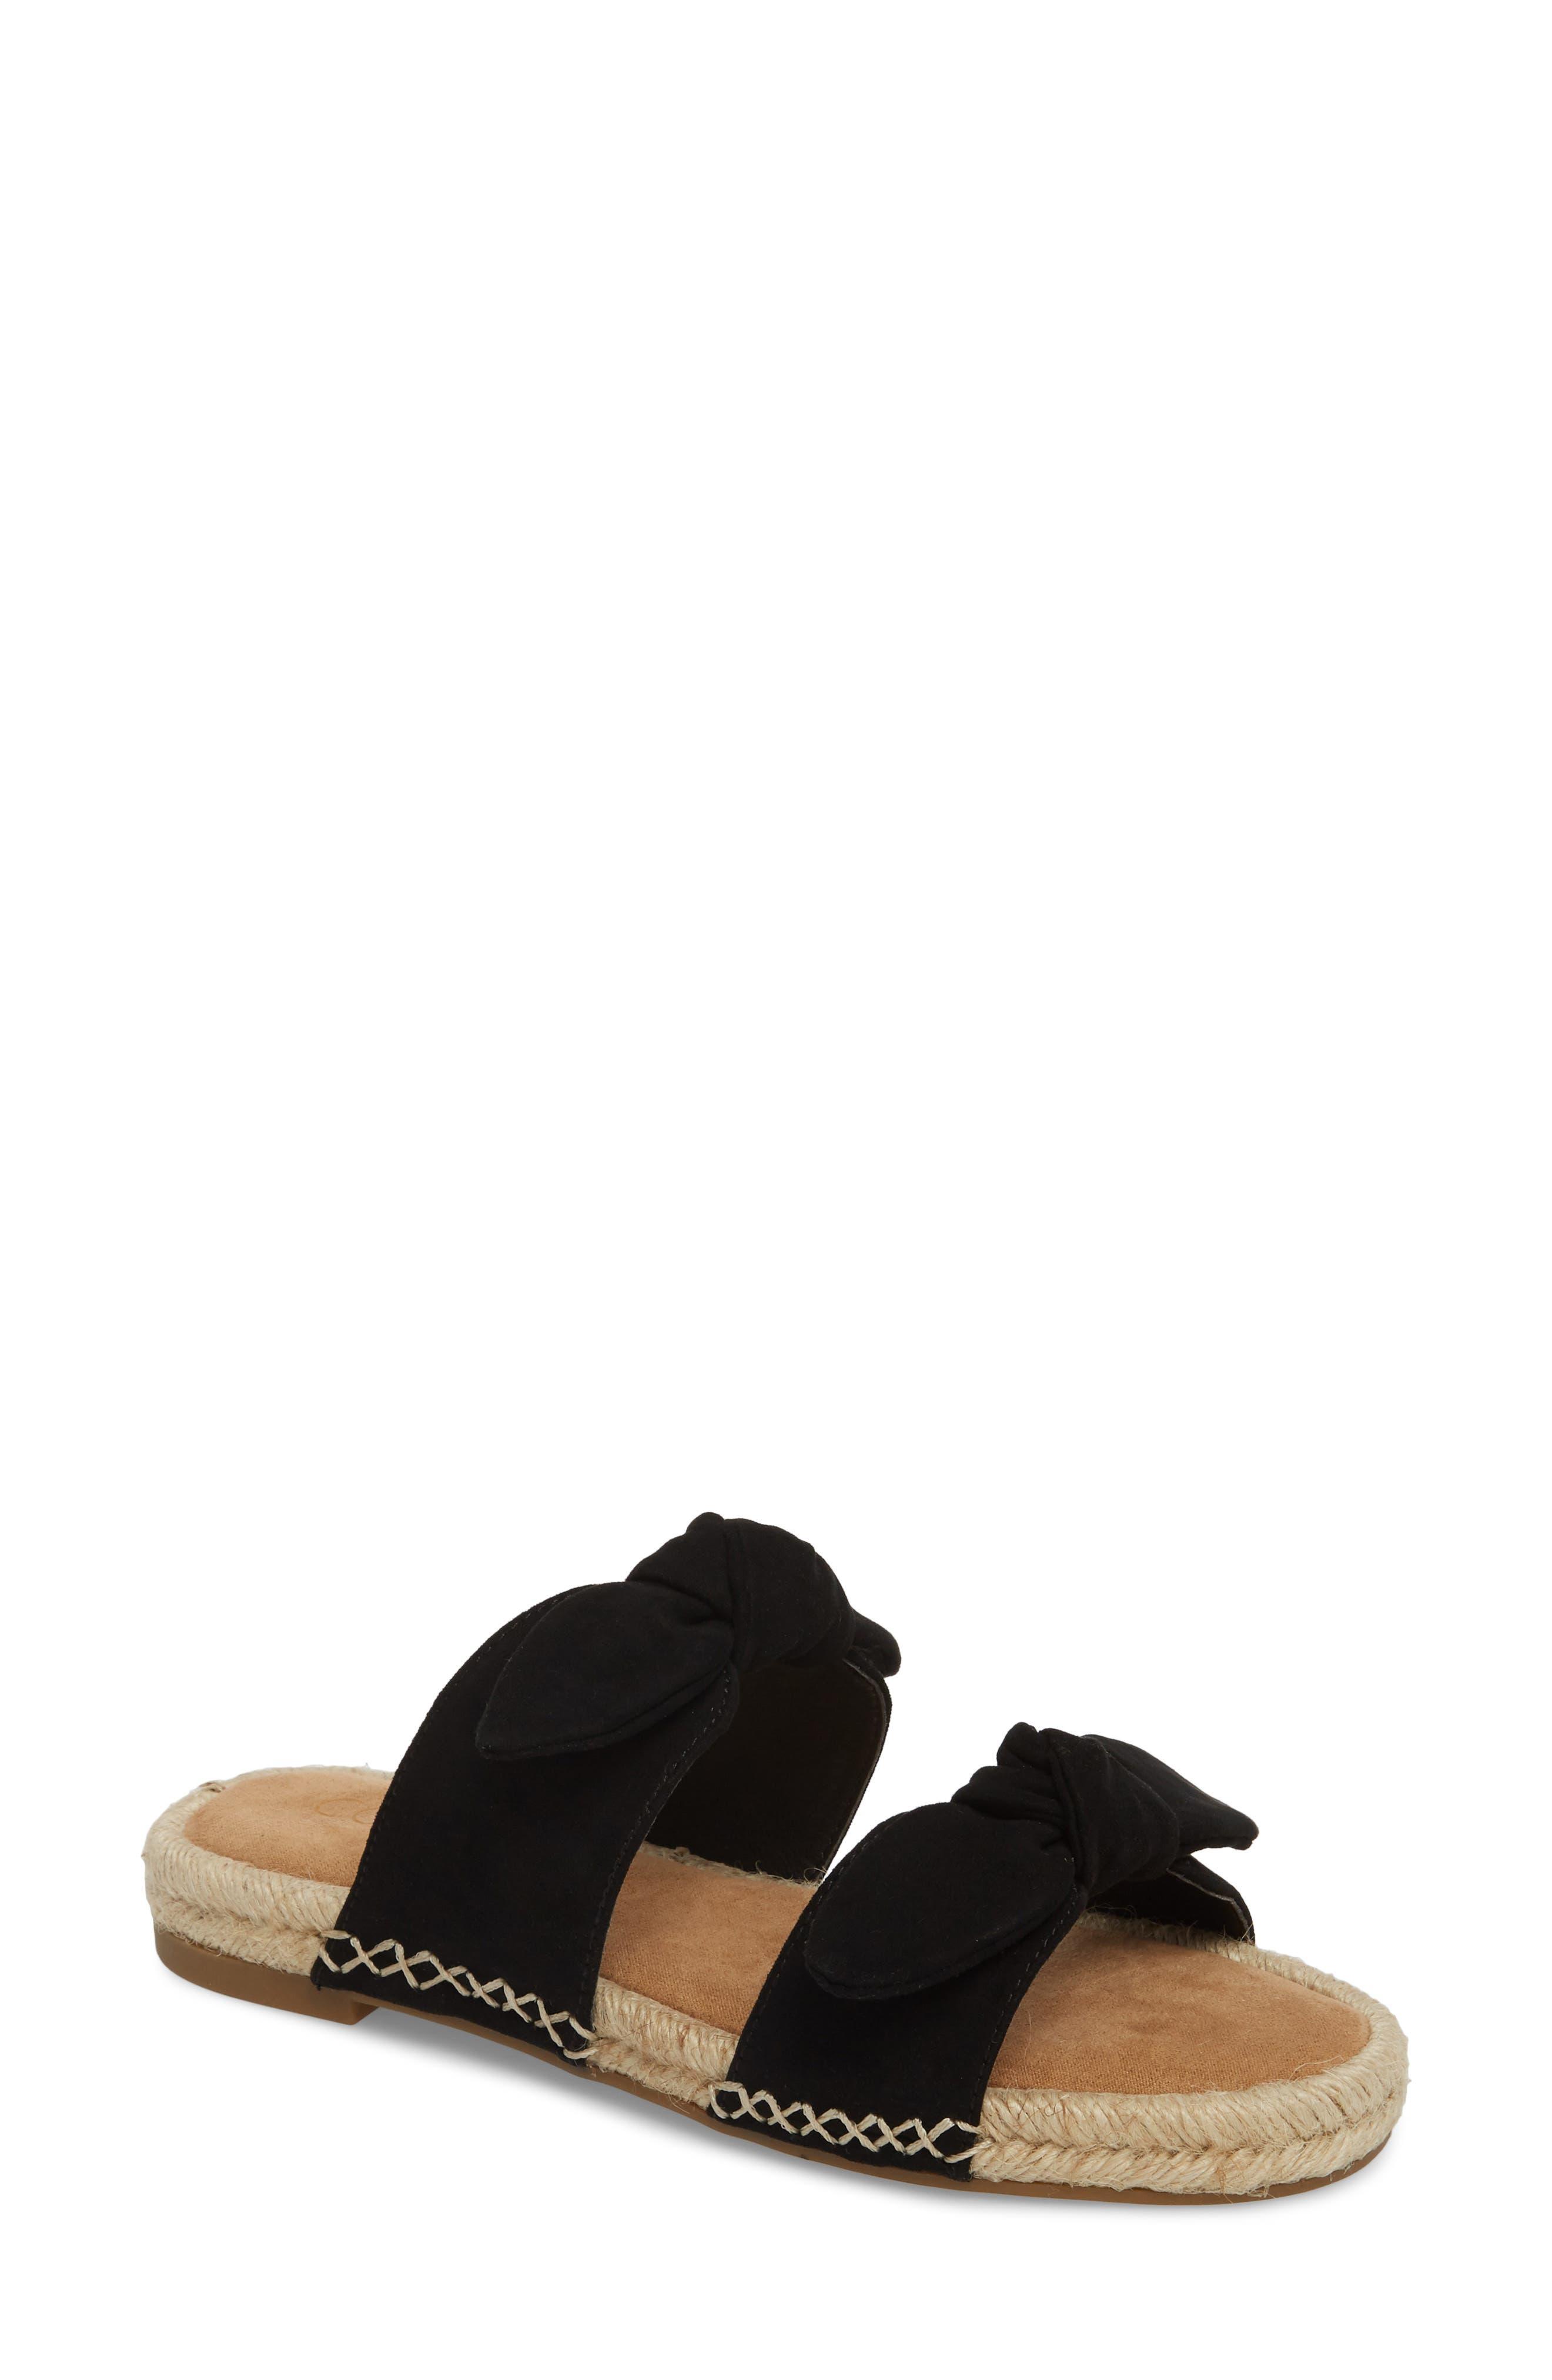 Gianna Espadrille Slide Sandal,                             Main thumbnail 1, color,                             Black Suede